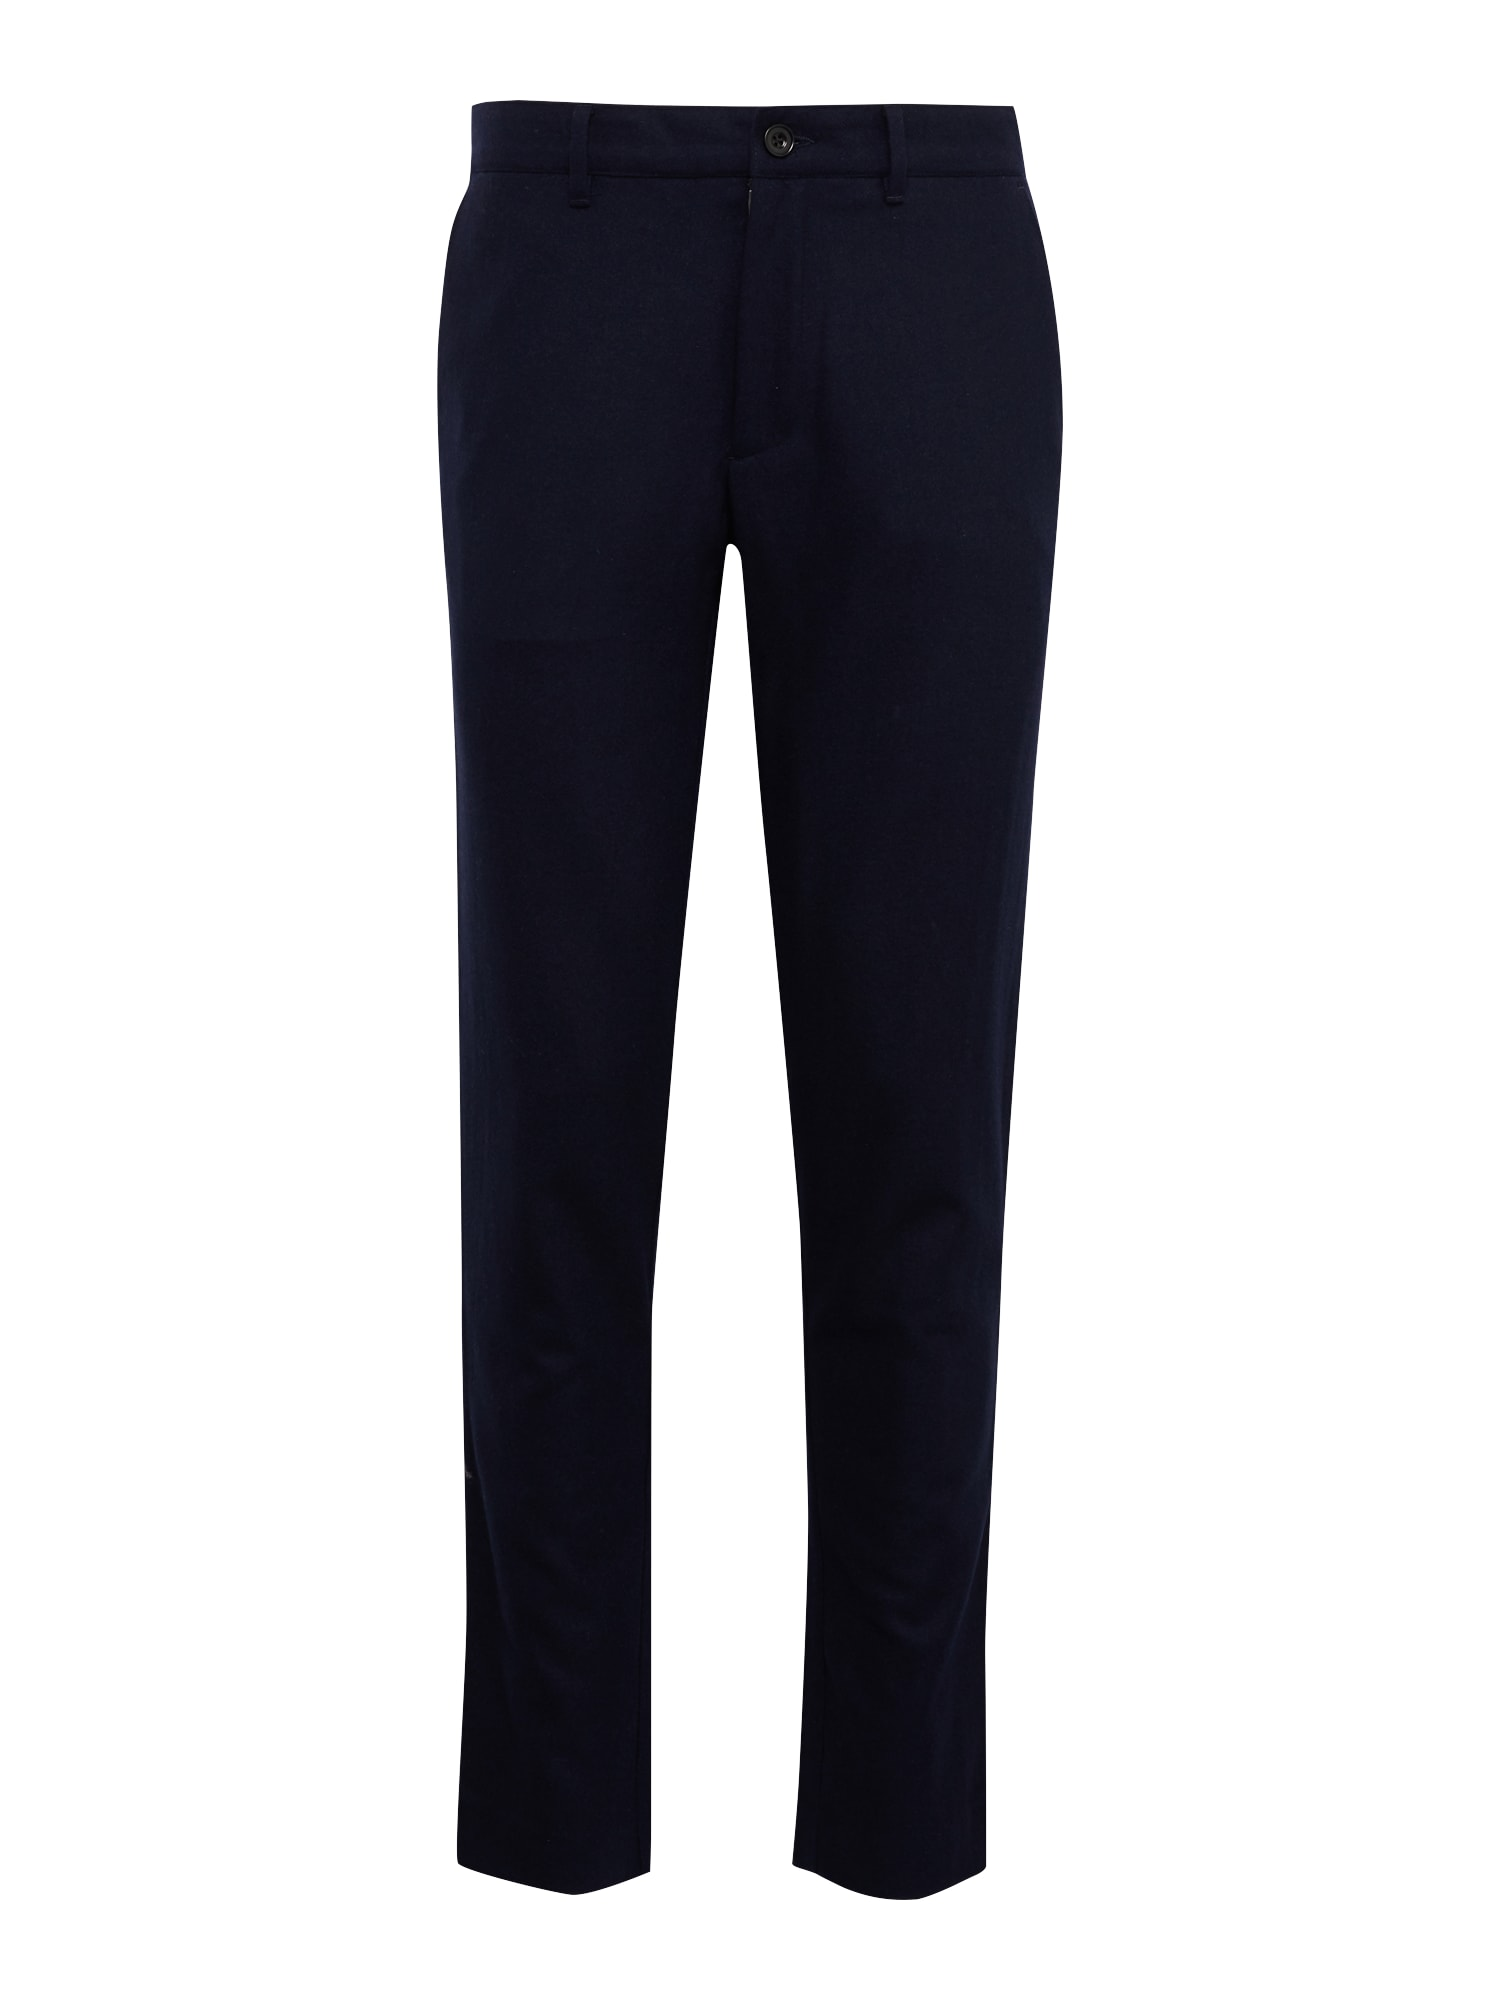 Kalhoty ELM WOOL námořnická modř FARAH